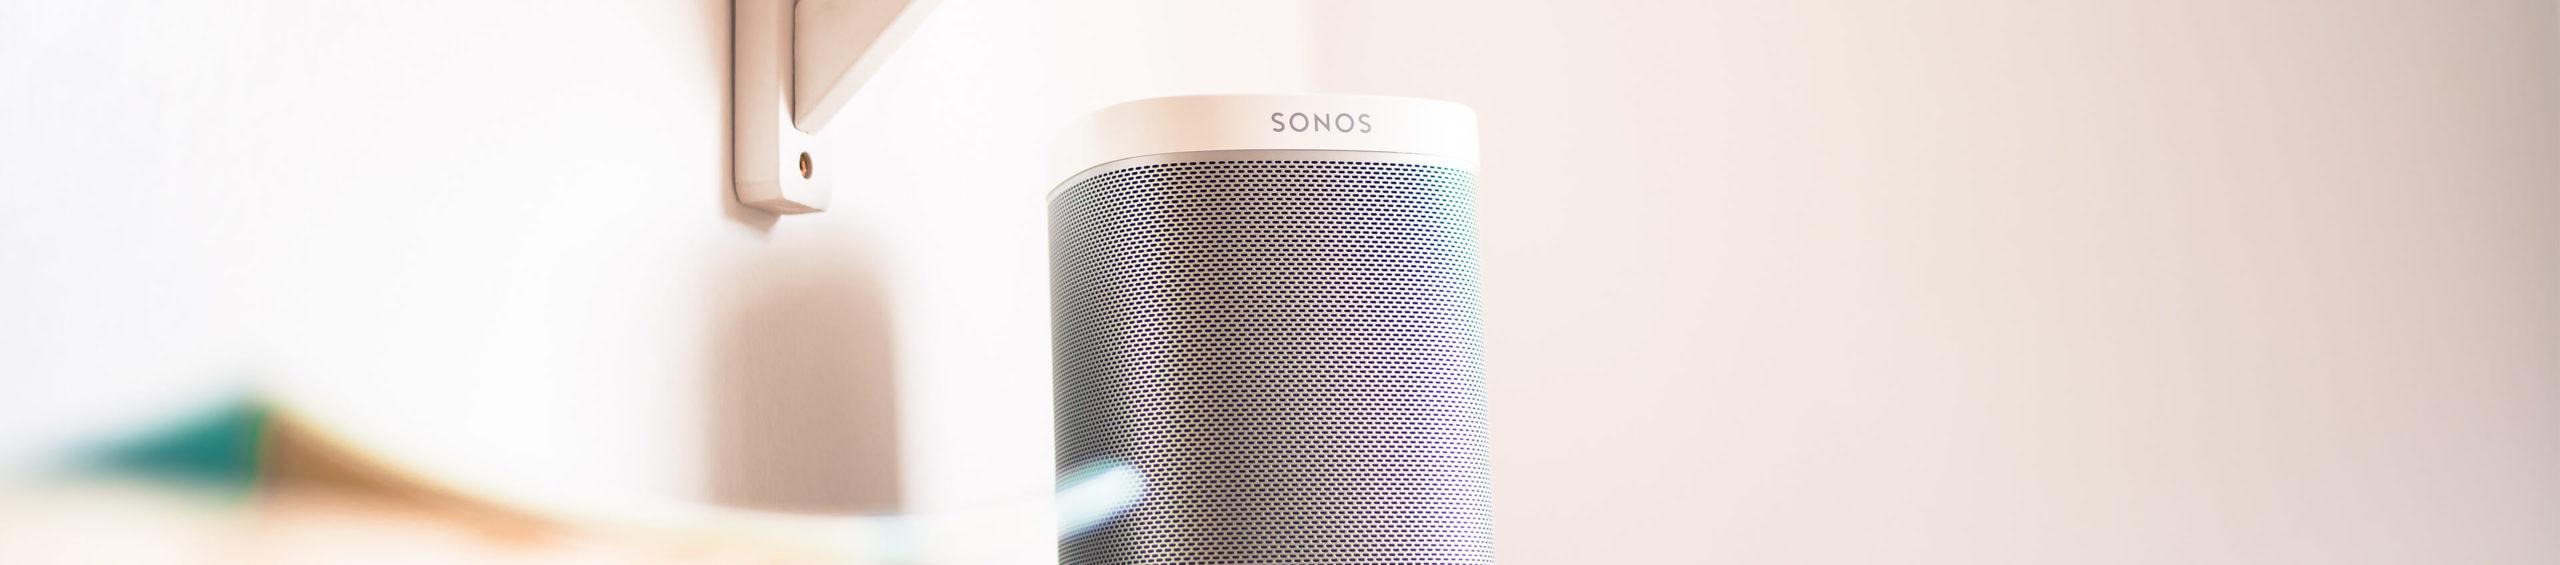 Sonos-Black-Friday